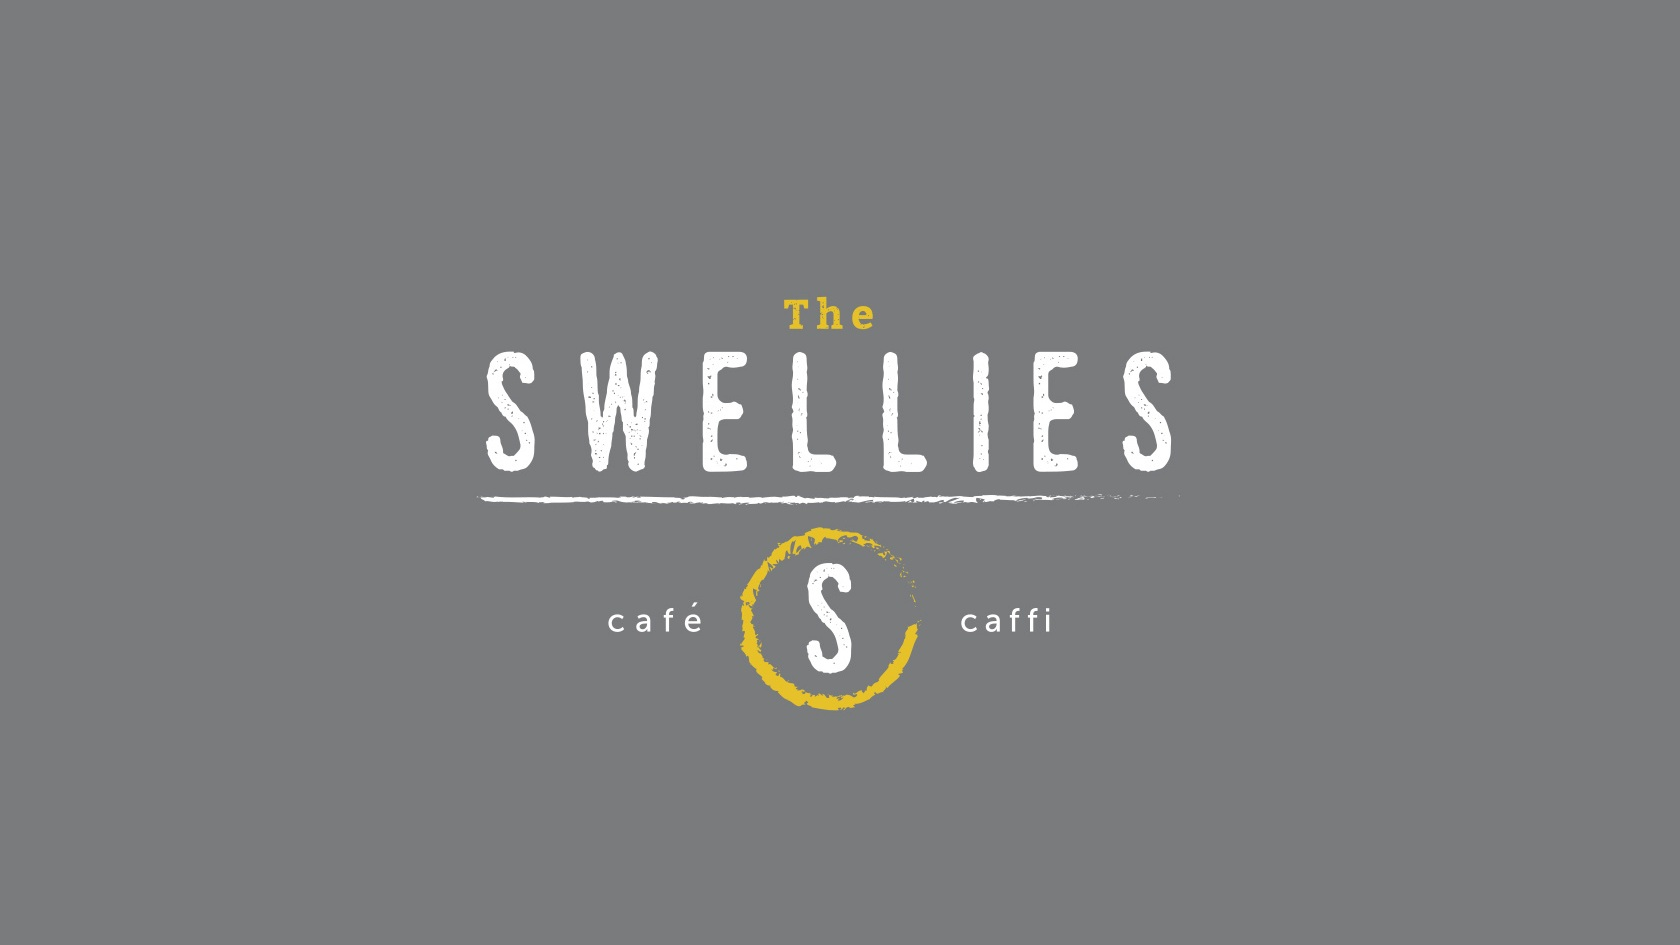 swellies_header.jpg